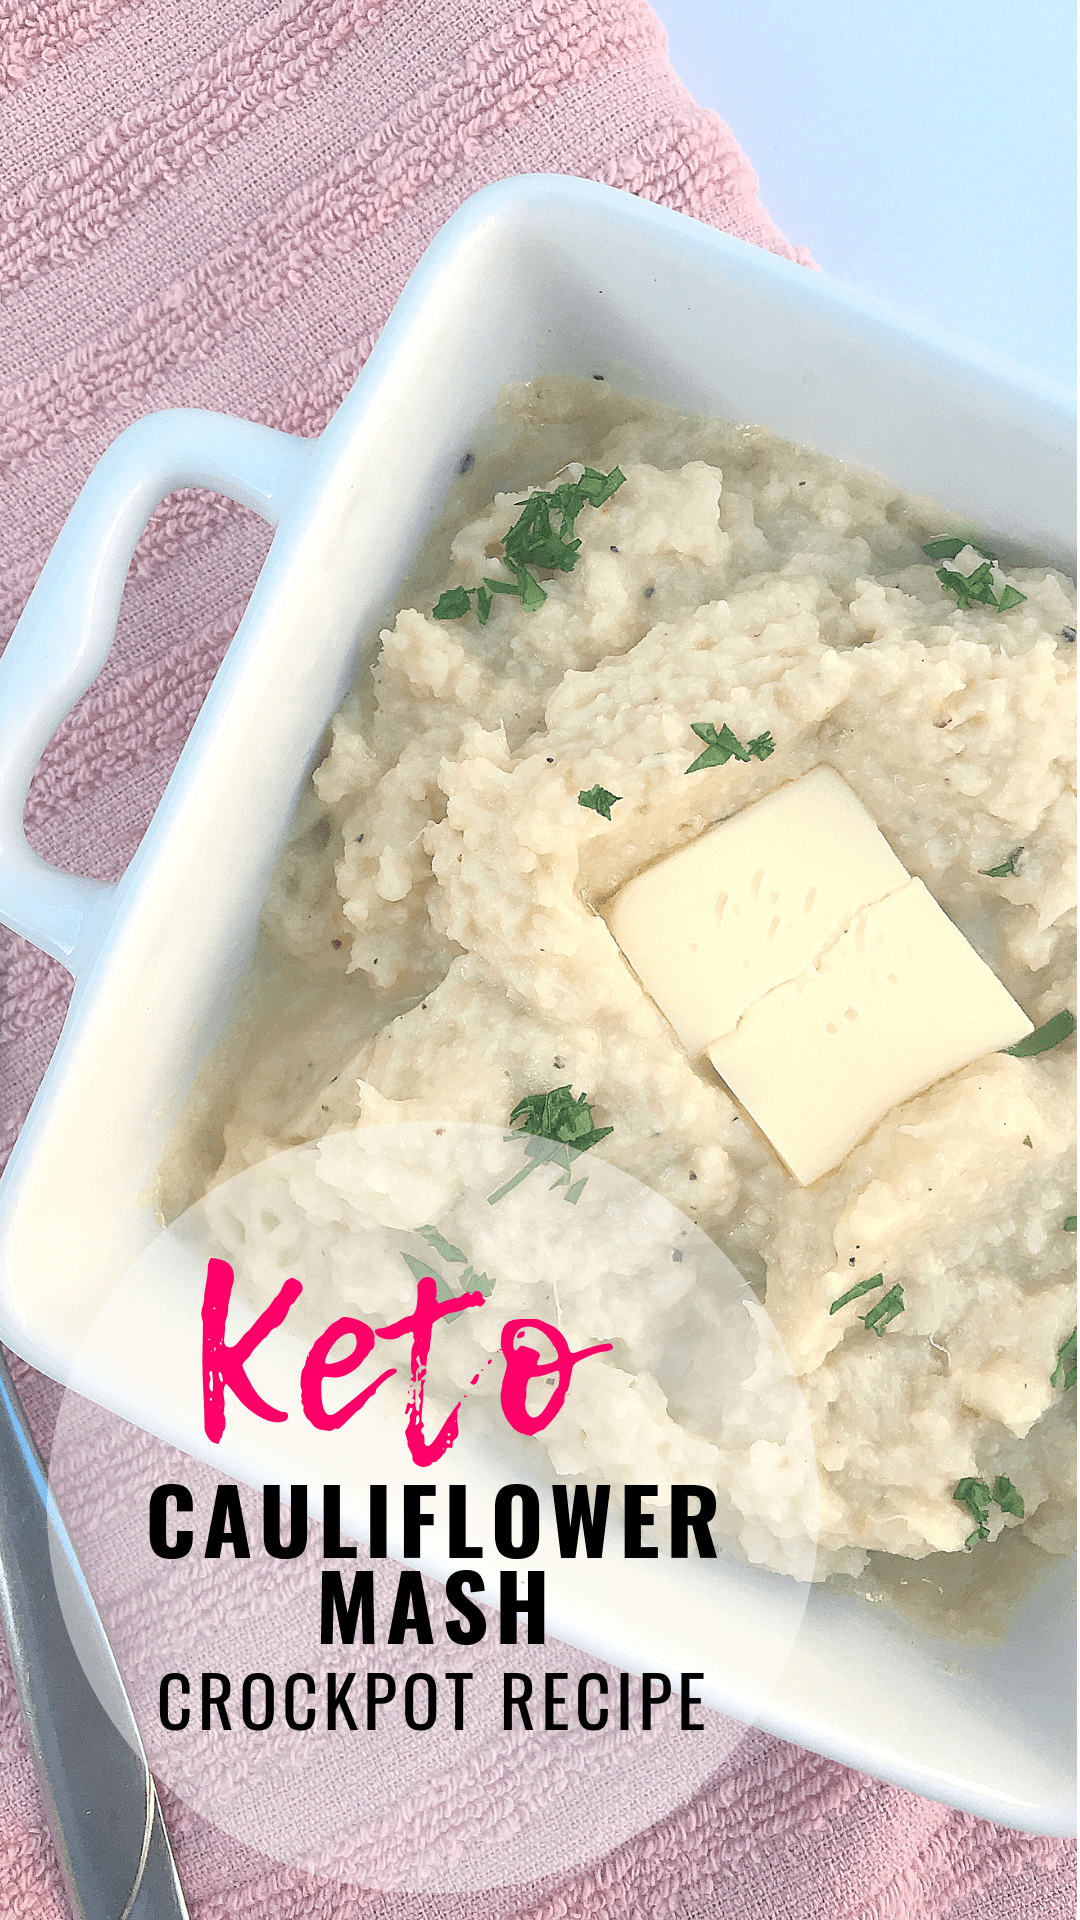 Keto Garlic Cauliflower Mashed Potatoes -Crockpot or Instant Pot Recipe